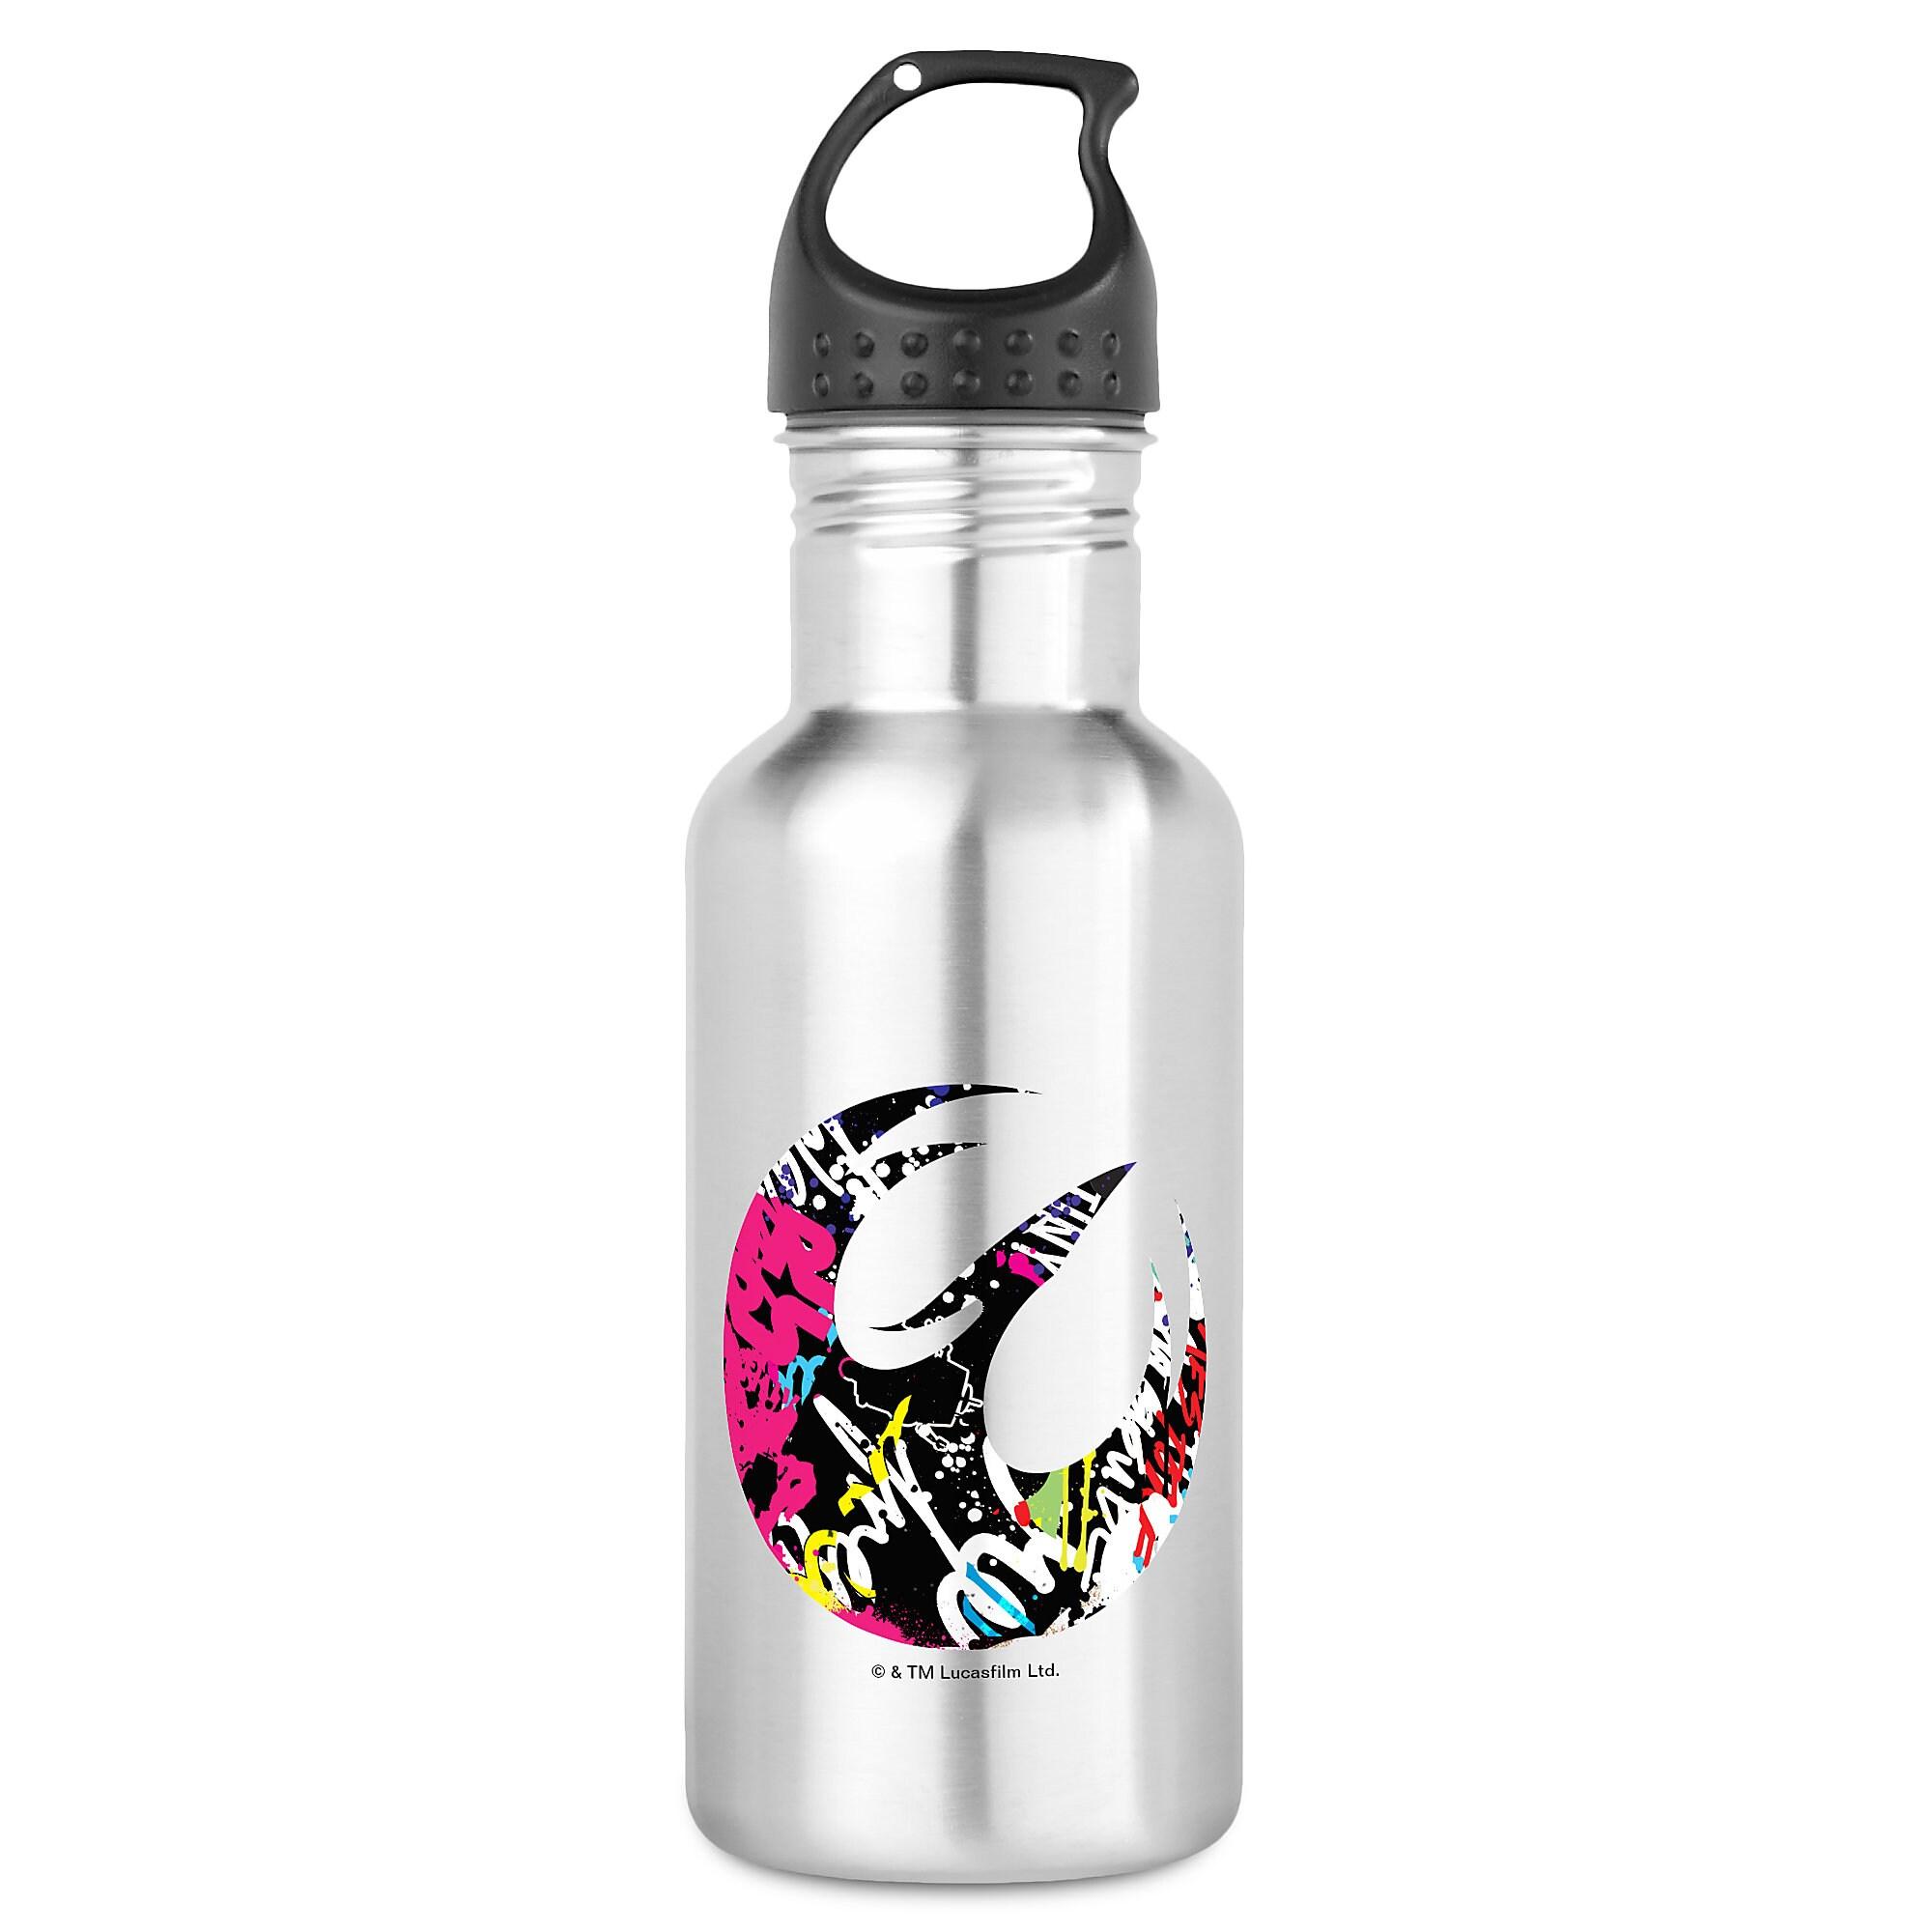 Star Wars Sabine Badge Water Bottle - Customizable